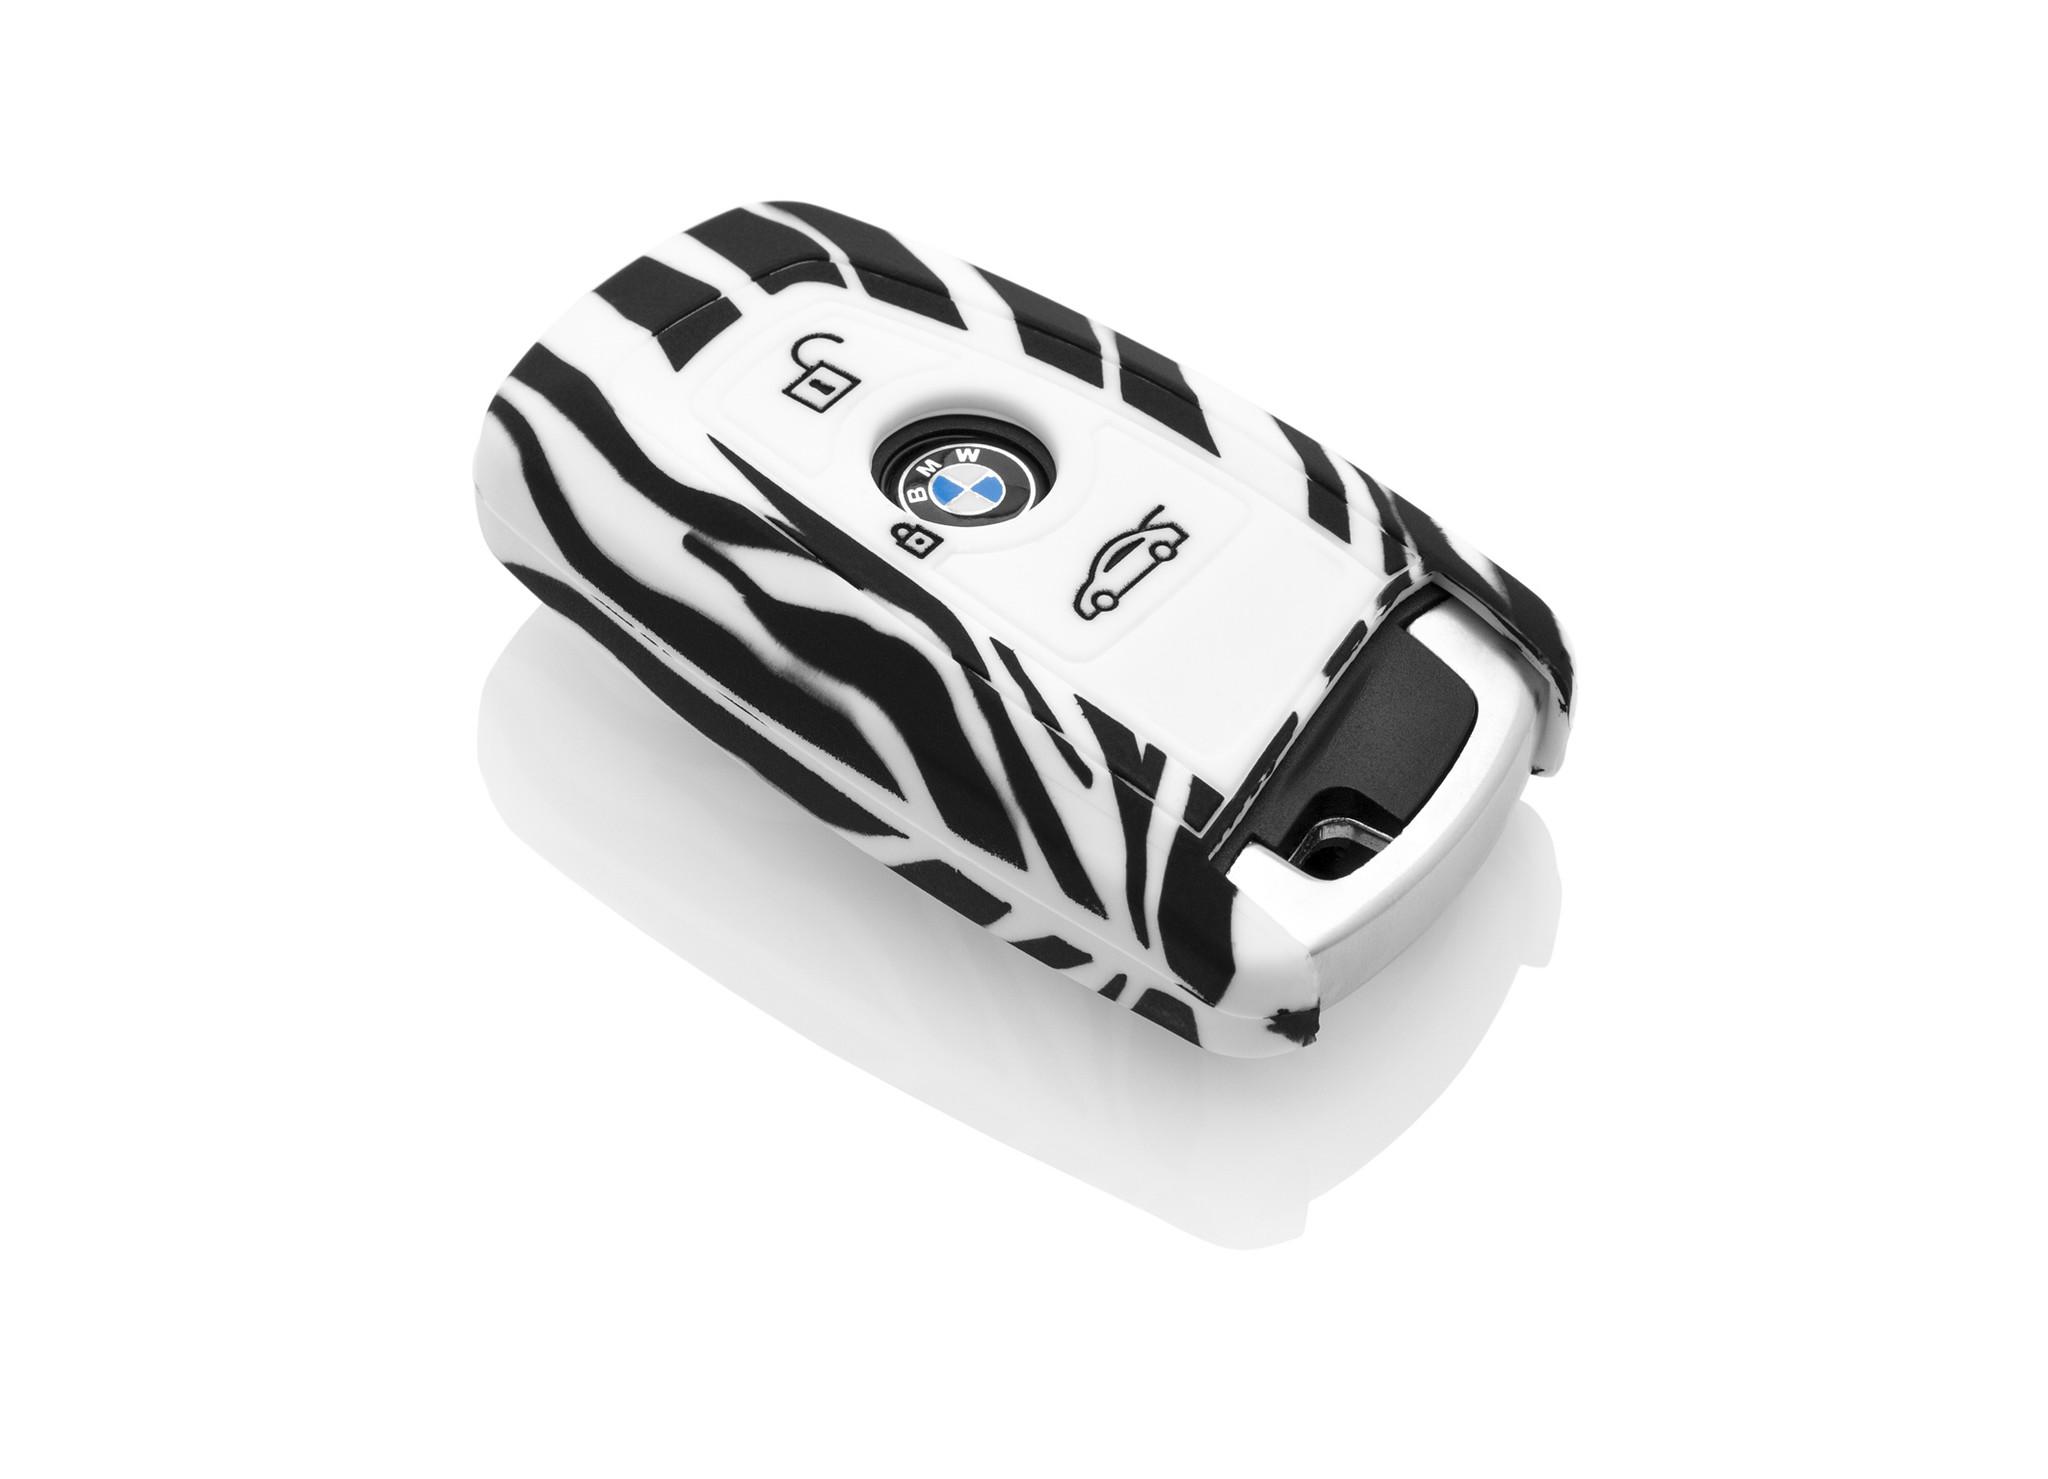 BMW Capa Silicone Chave do carro - Capa protetora - Tampa remota FOB - Zebra